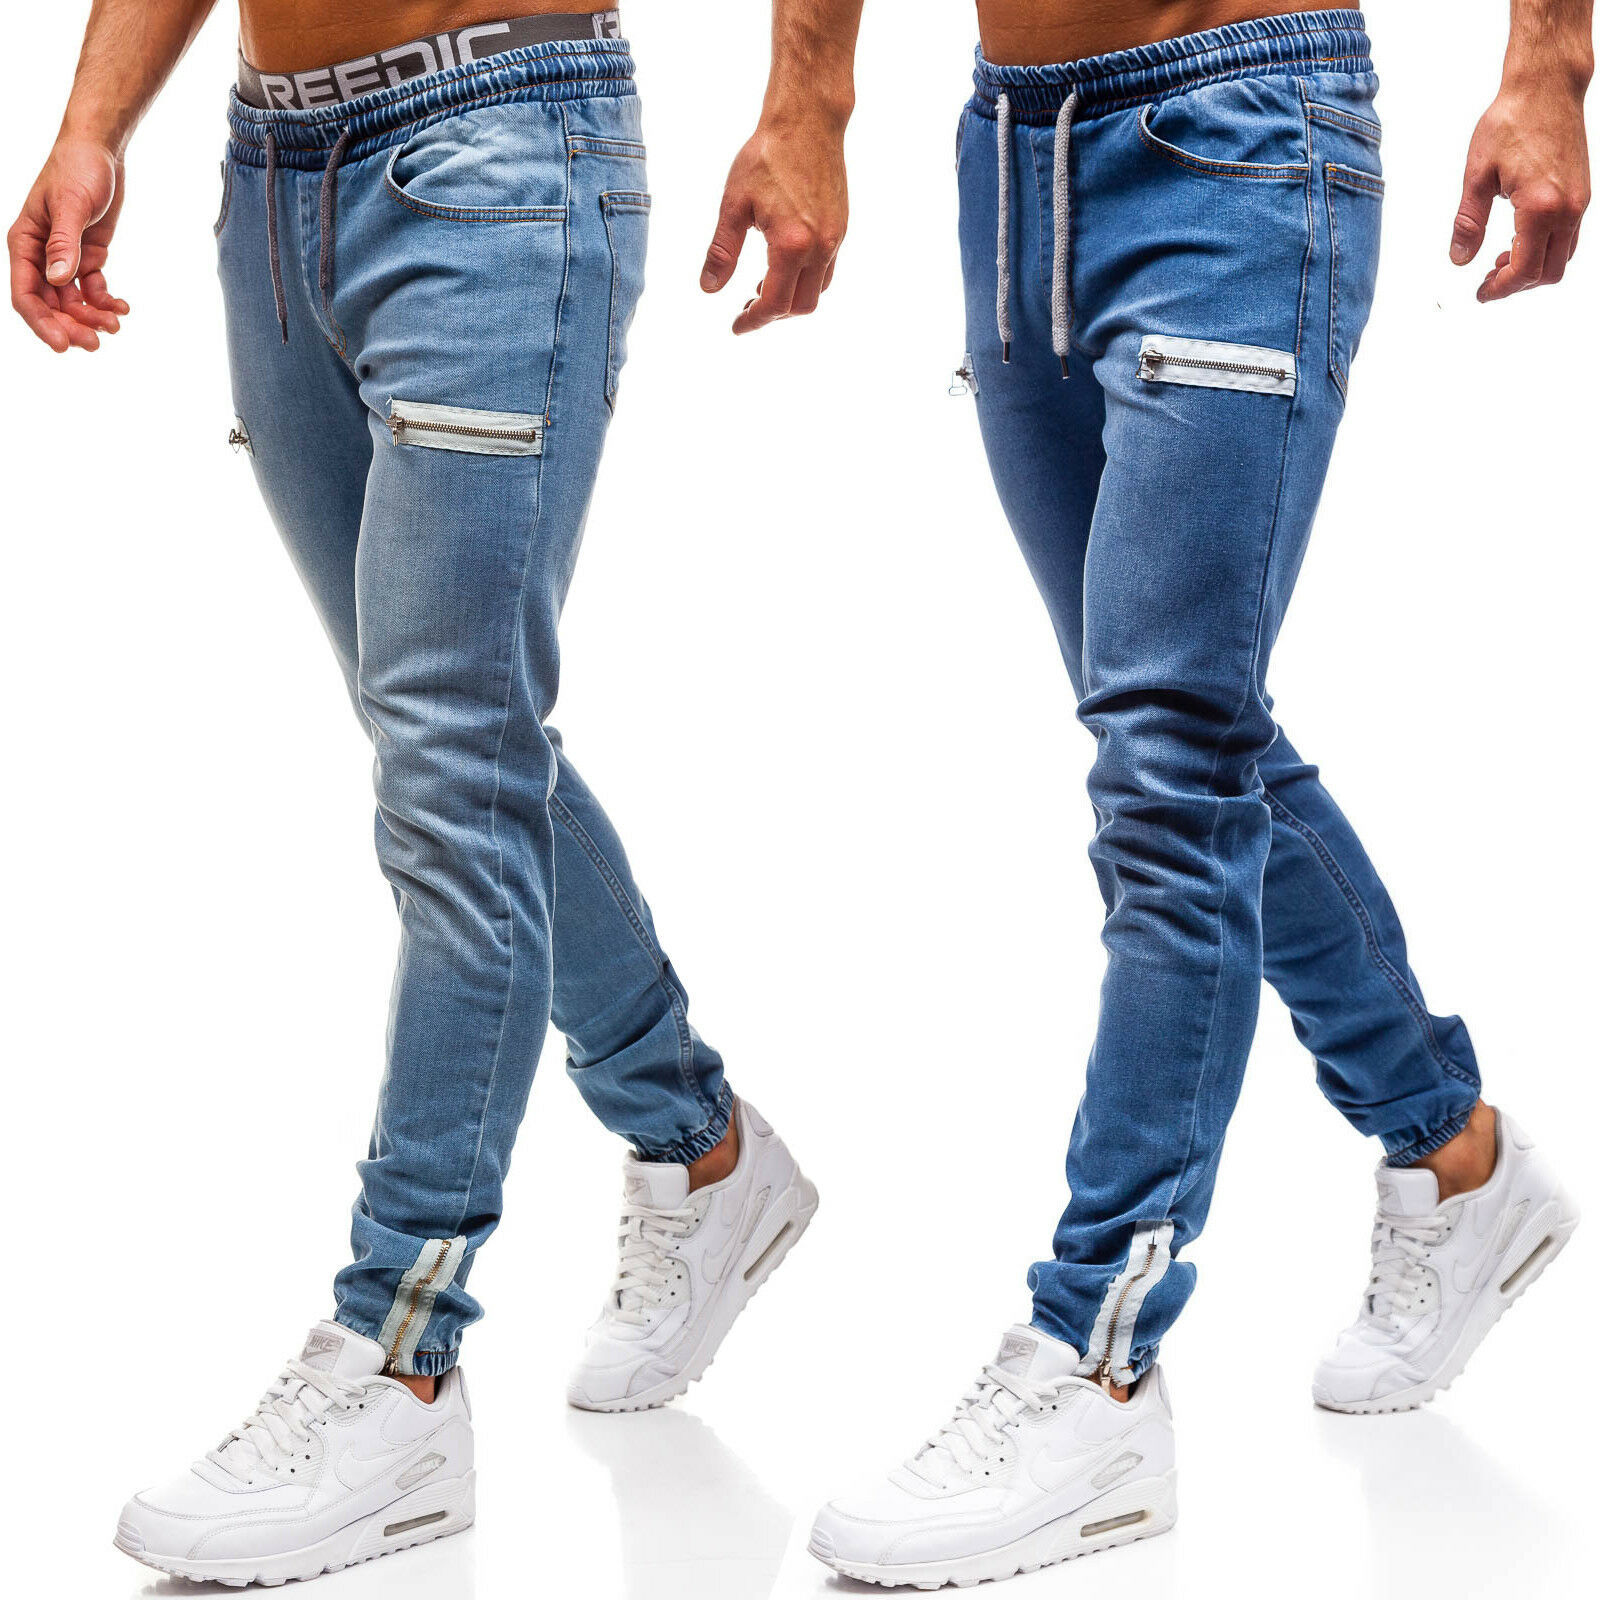 REPPUNK 2019 Fashion Trend Men's Jogging Pants Denim Fabric Casual Zipper Design Jeans Male Elastic Slim Feet Trousers